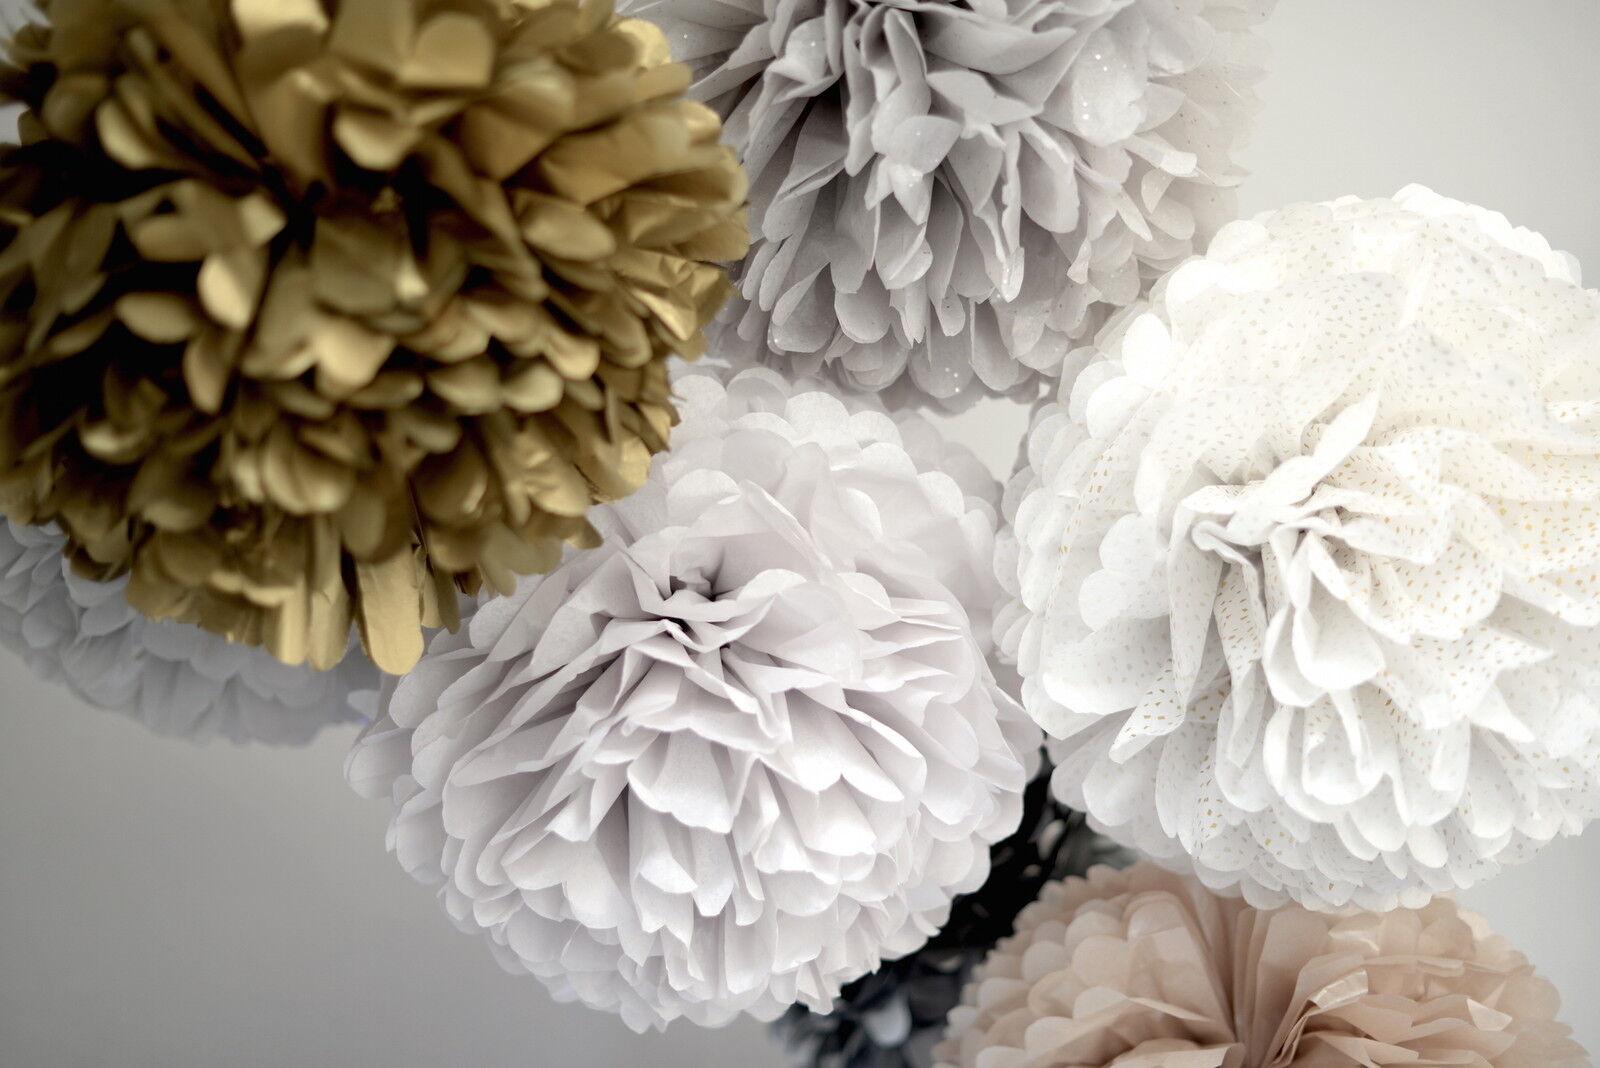 20 shimery tissue paper pom poms set - 3 Größes - wedding party decorations